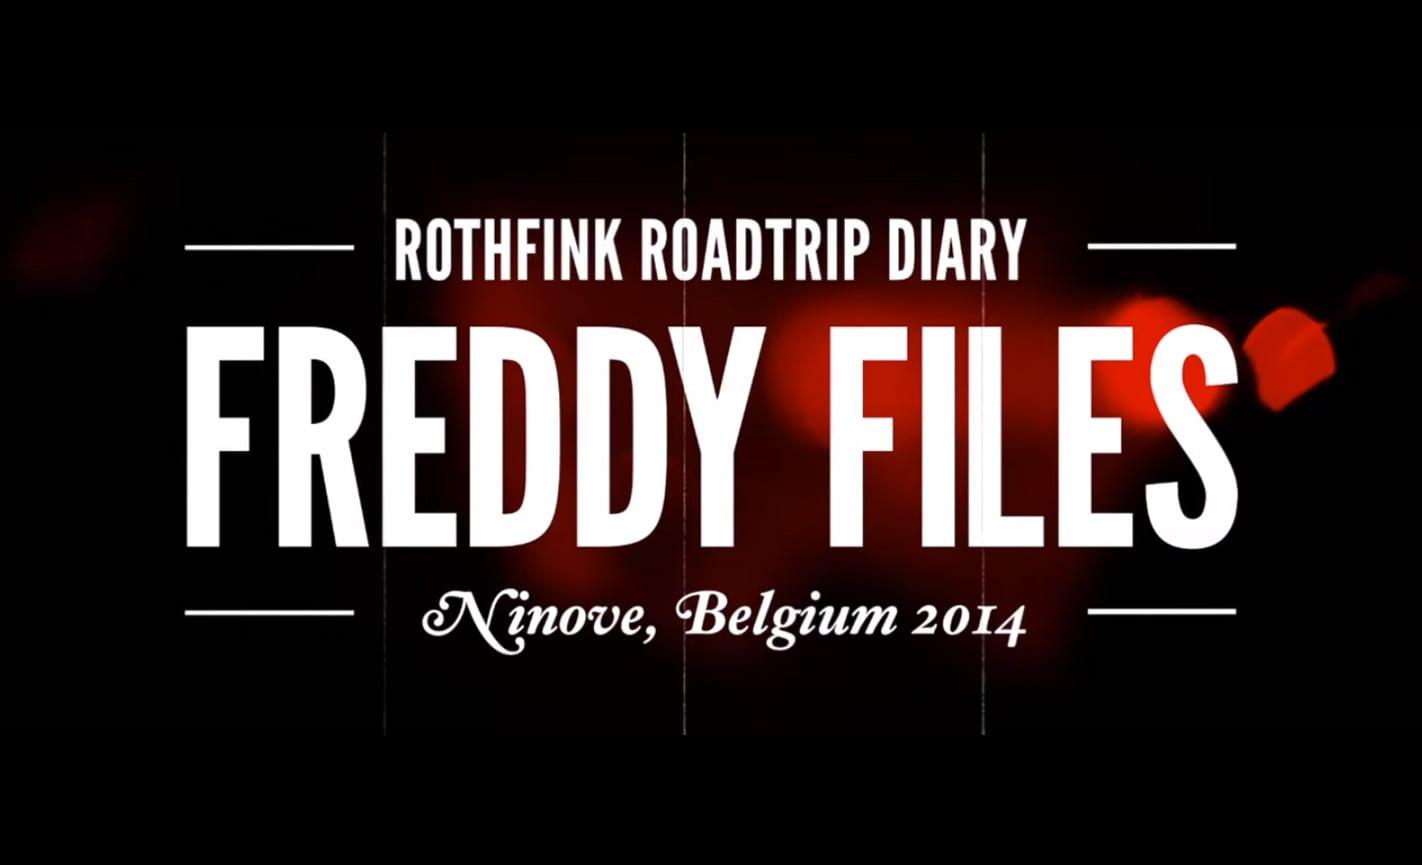 Rothfink Industries vs Freddy Files 2014